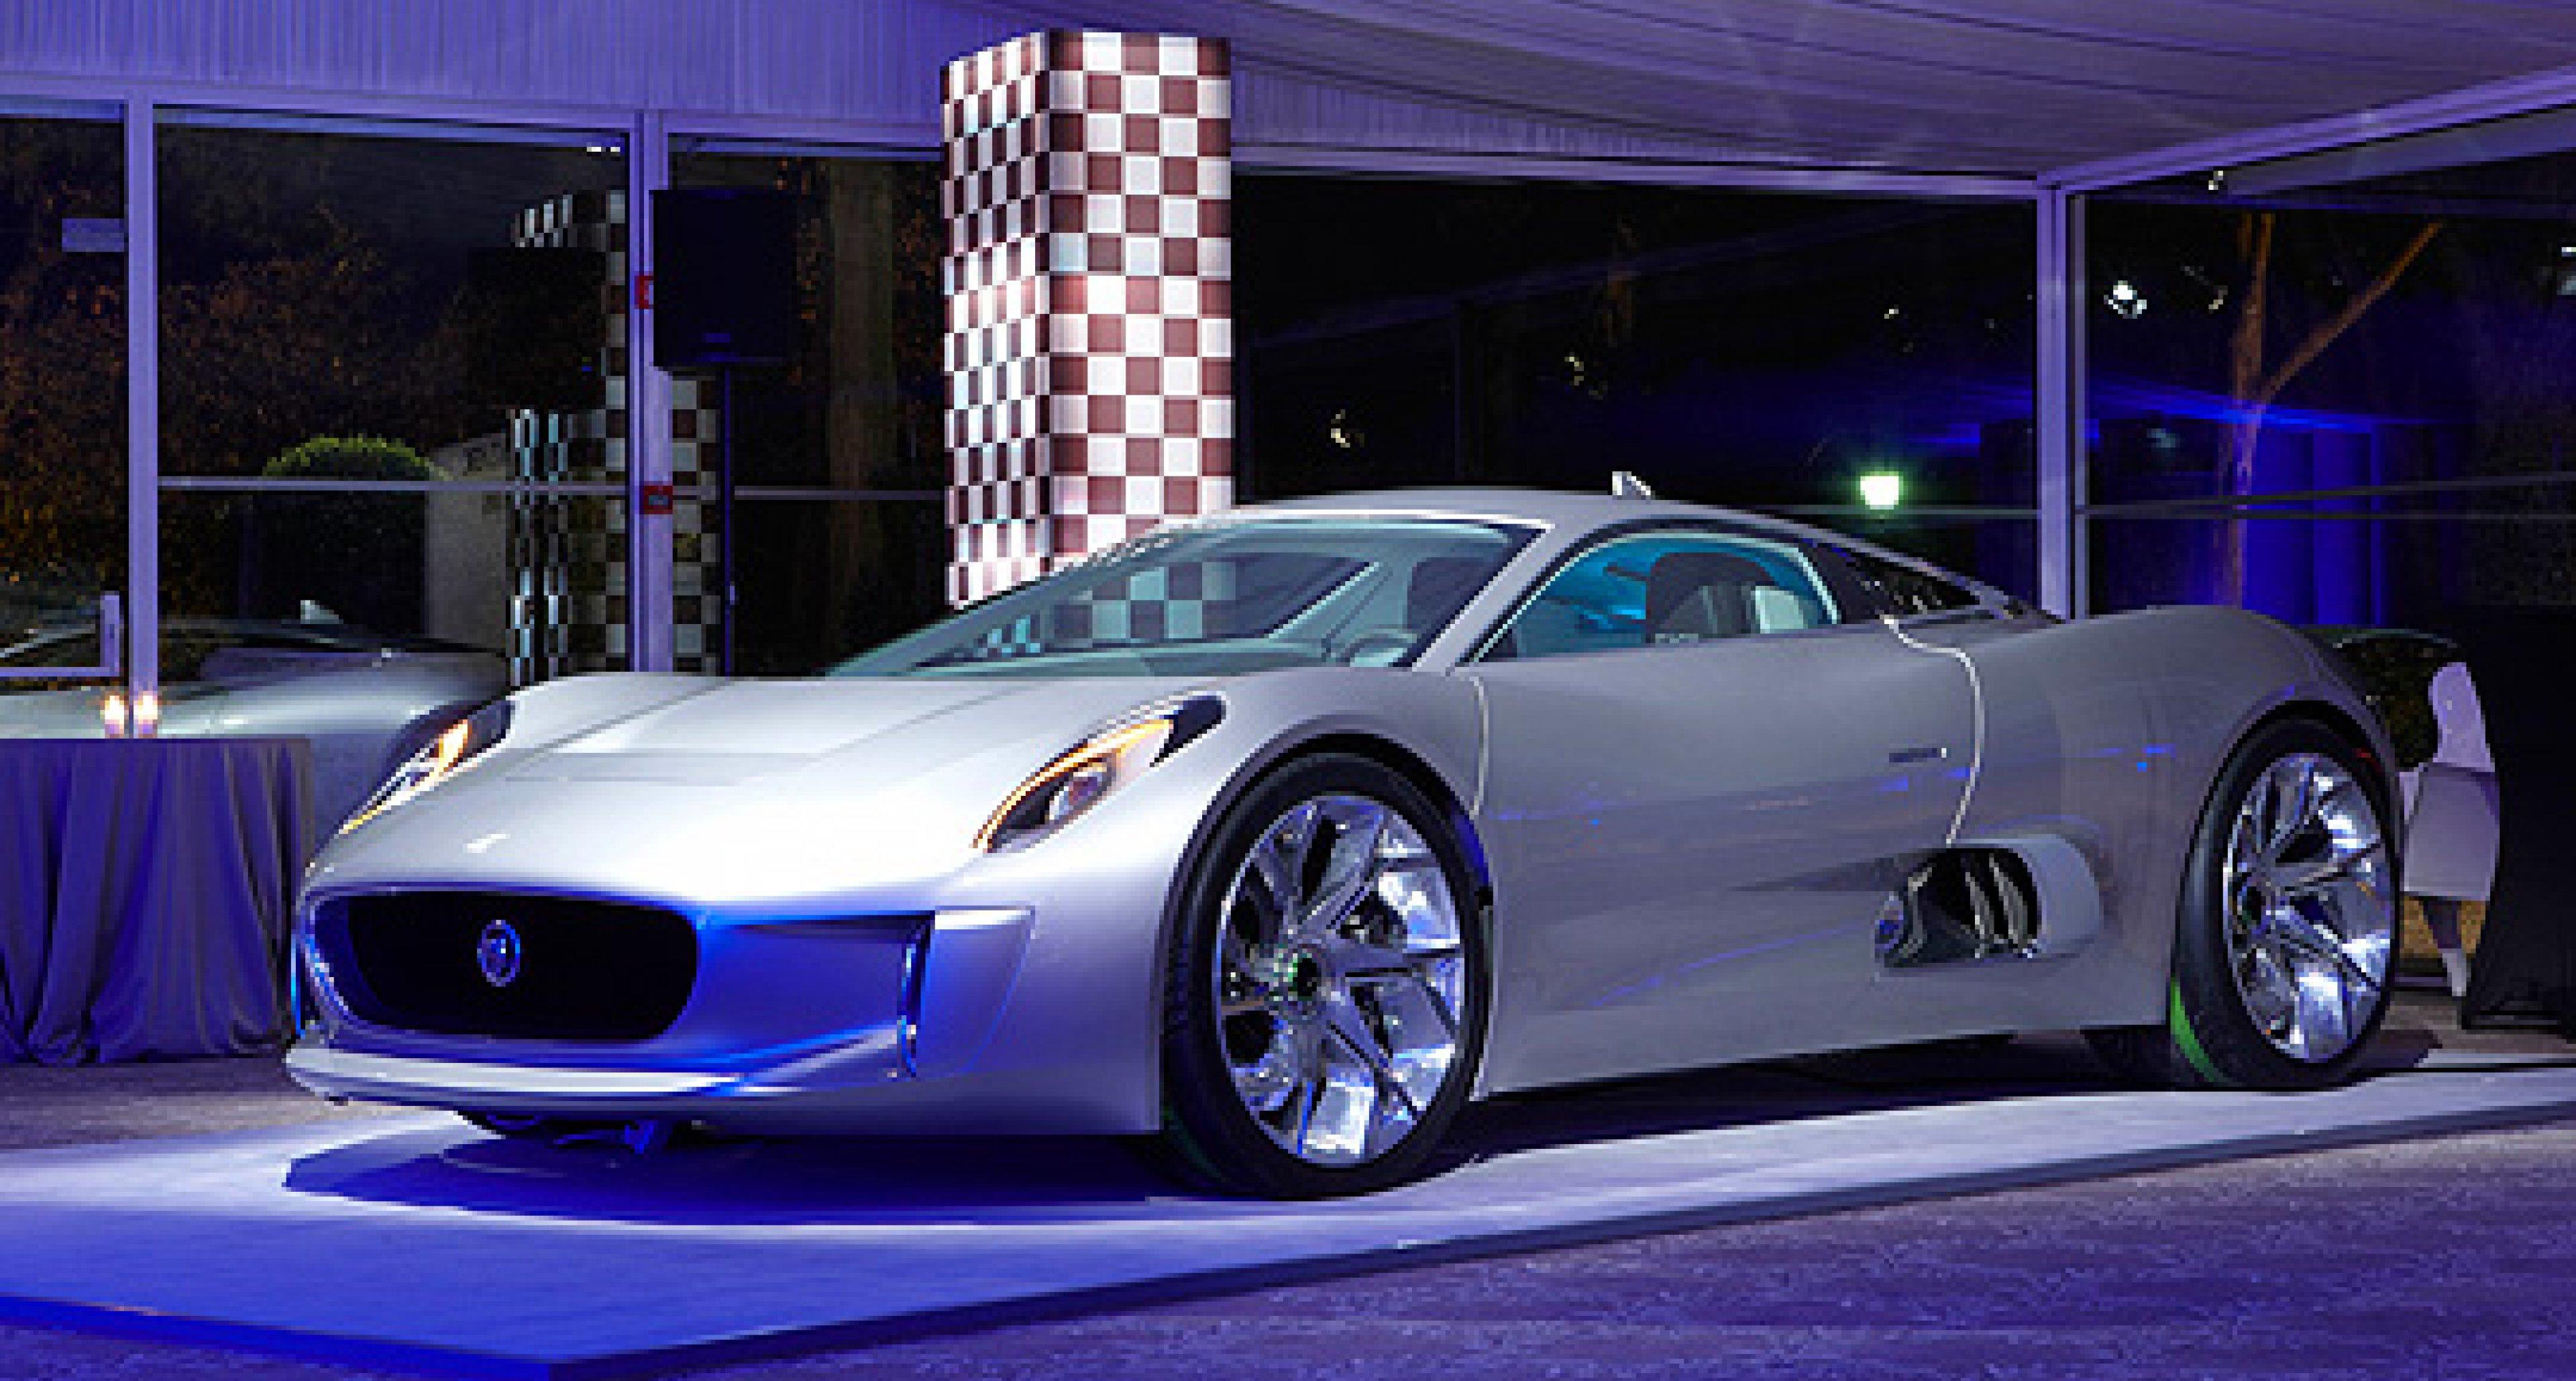 Louis Vuitton Classic Awards 2010/11: Talbot-Lago and Jaguar Prevail